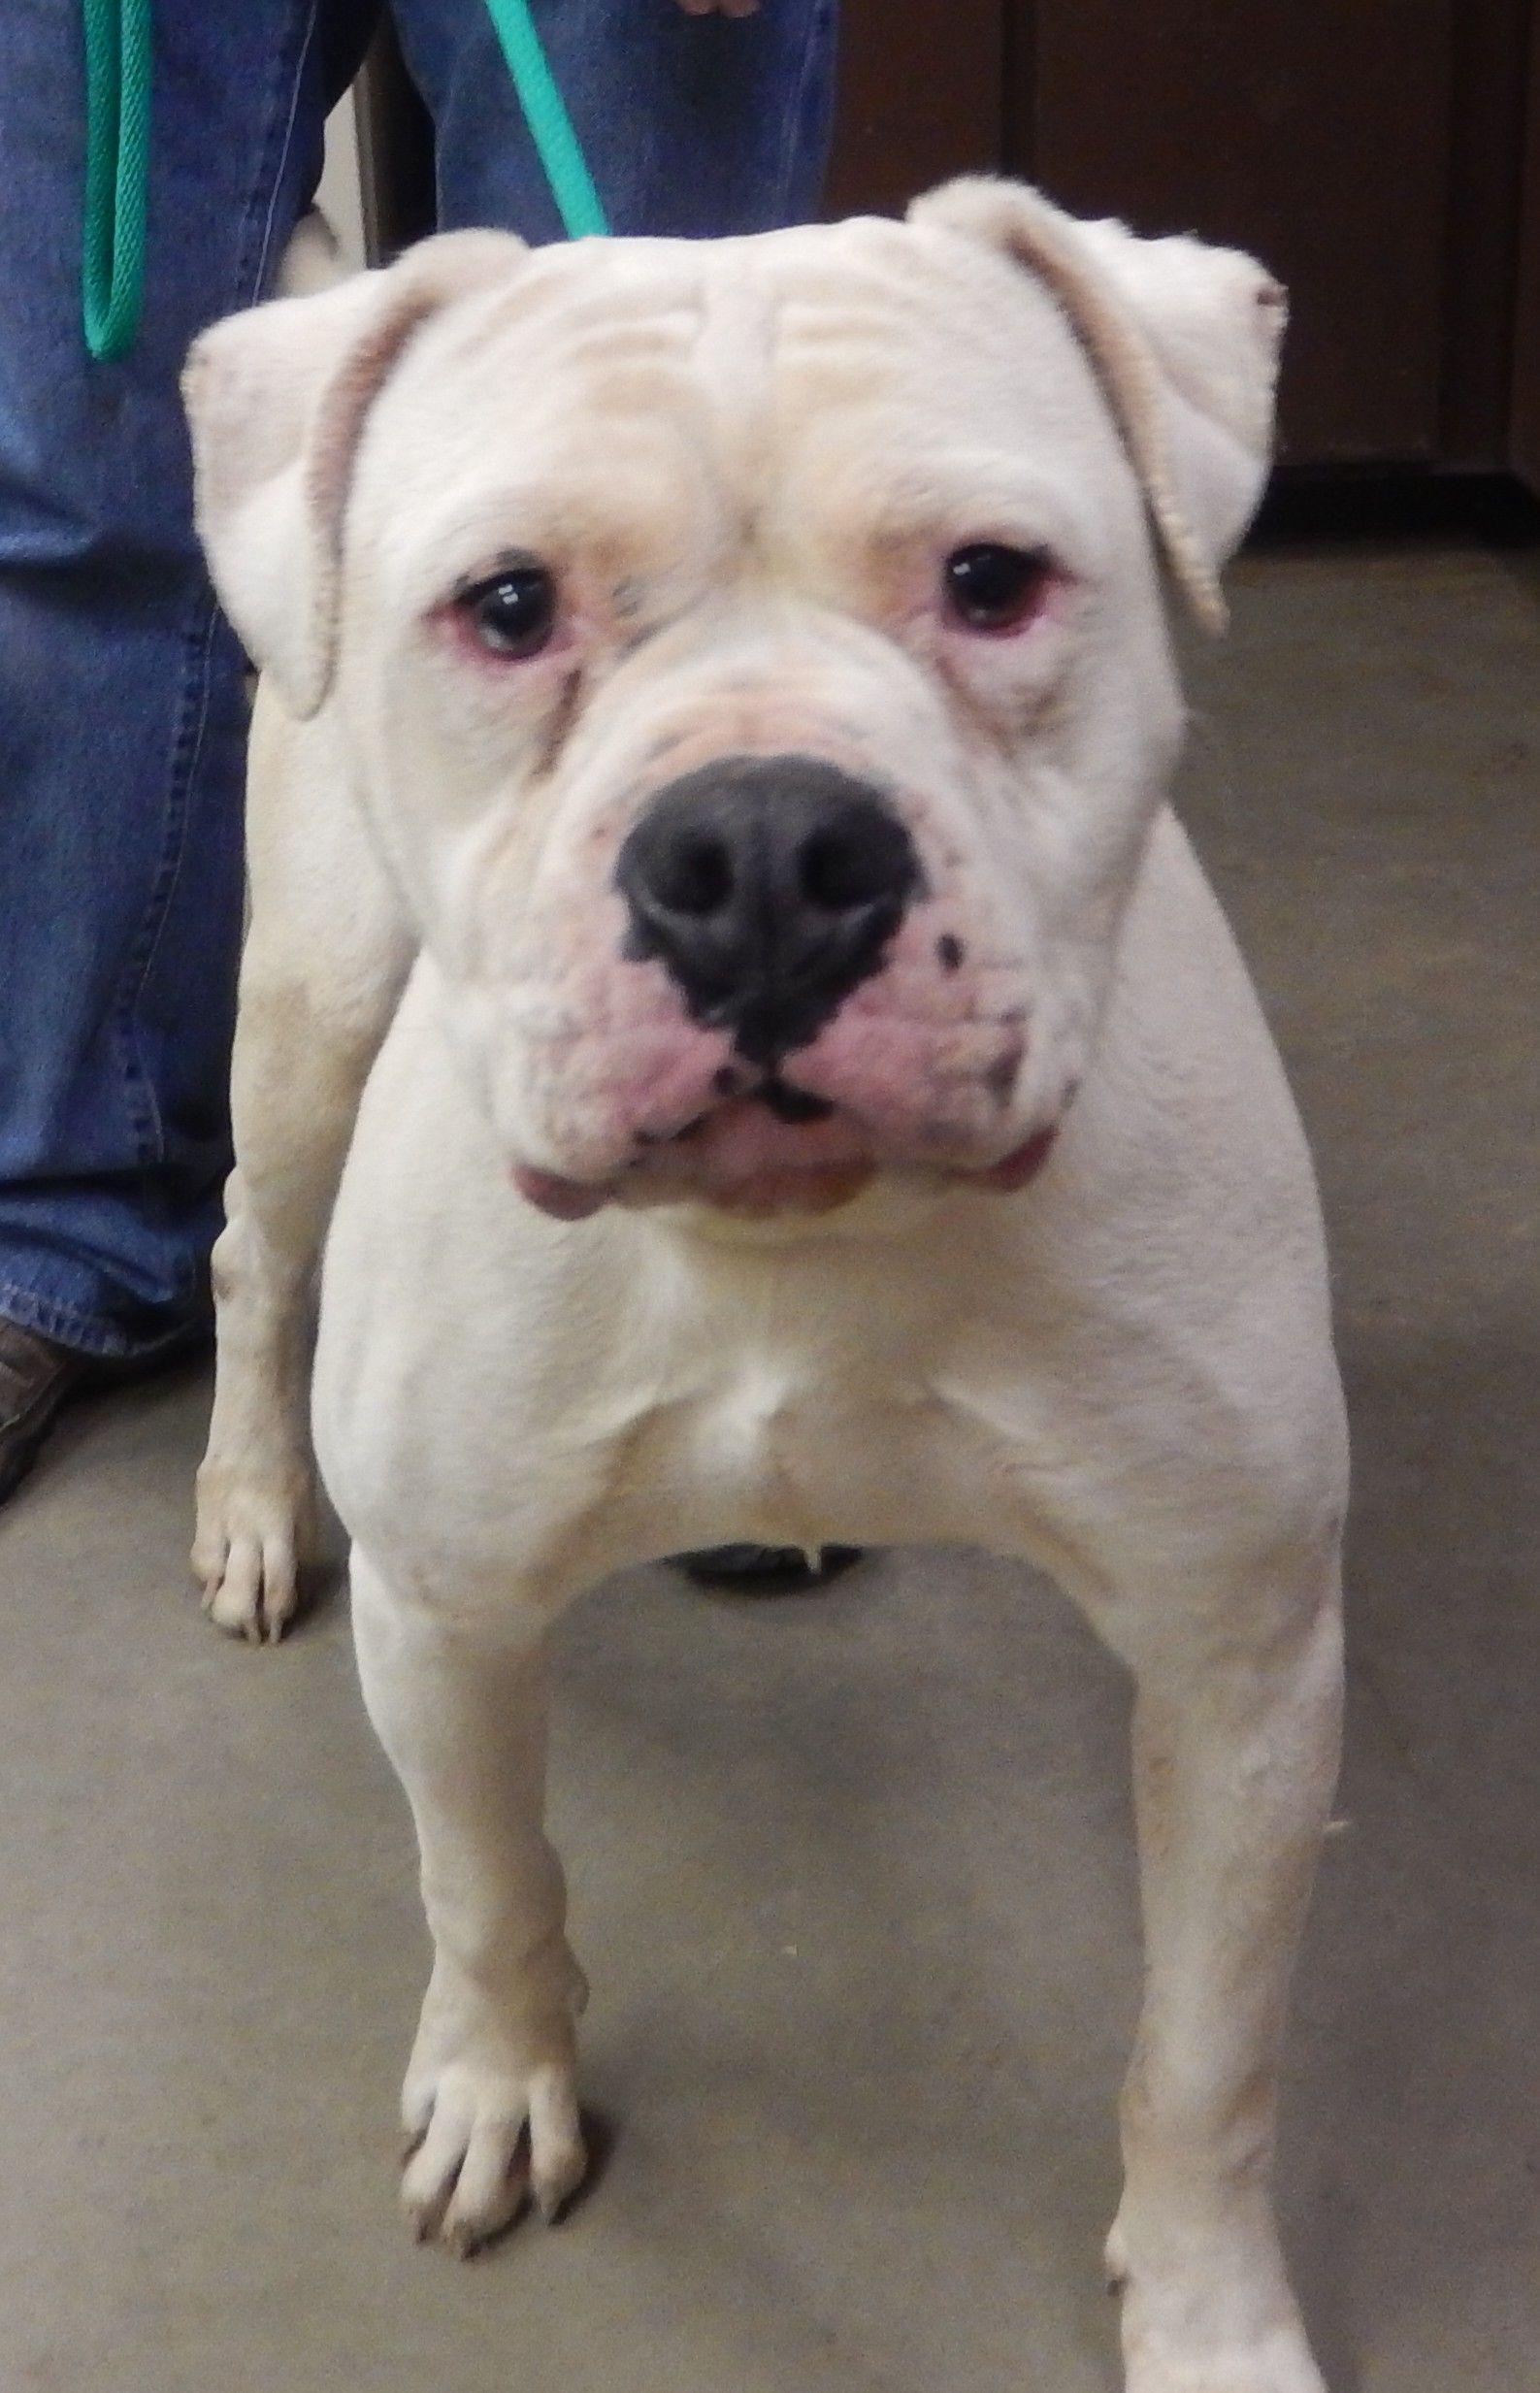 American Bulldog dog for Adoption in Amarillo, TX. ADN